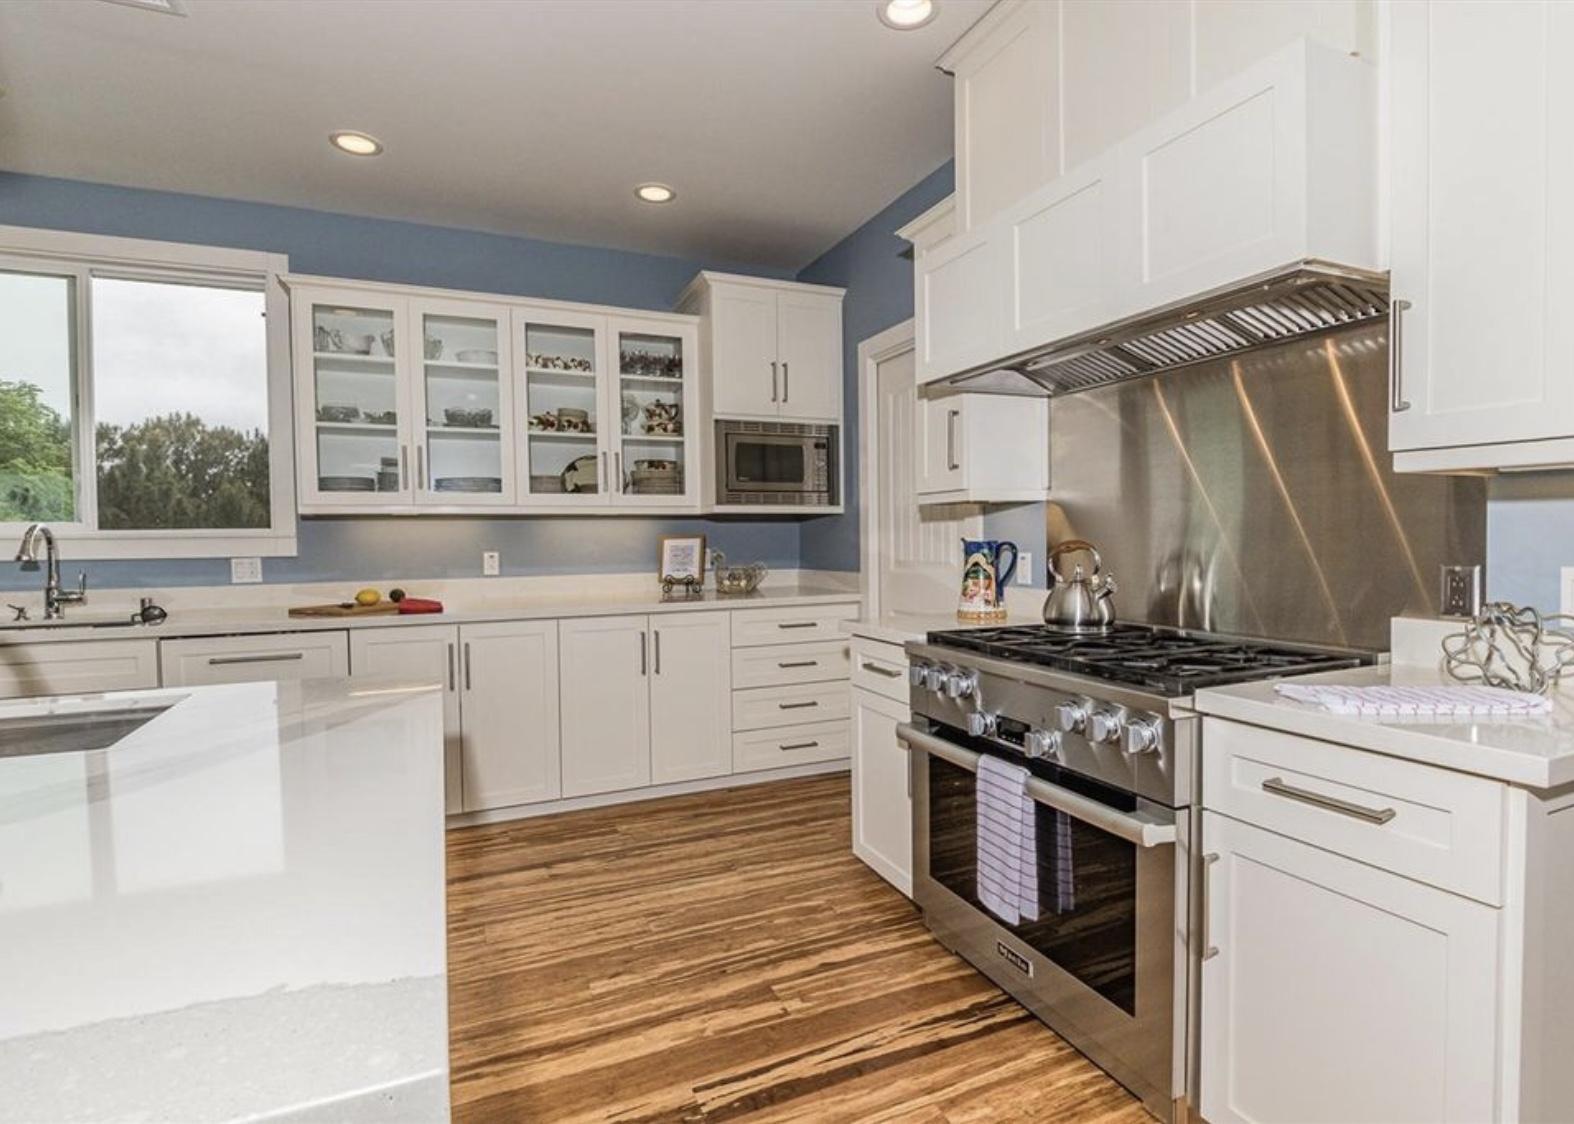 PG Hardwood | Decorators White & Dovetail Gray CV Paint | Shaker Style + Cambria Quartz